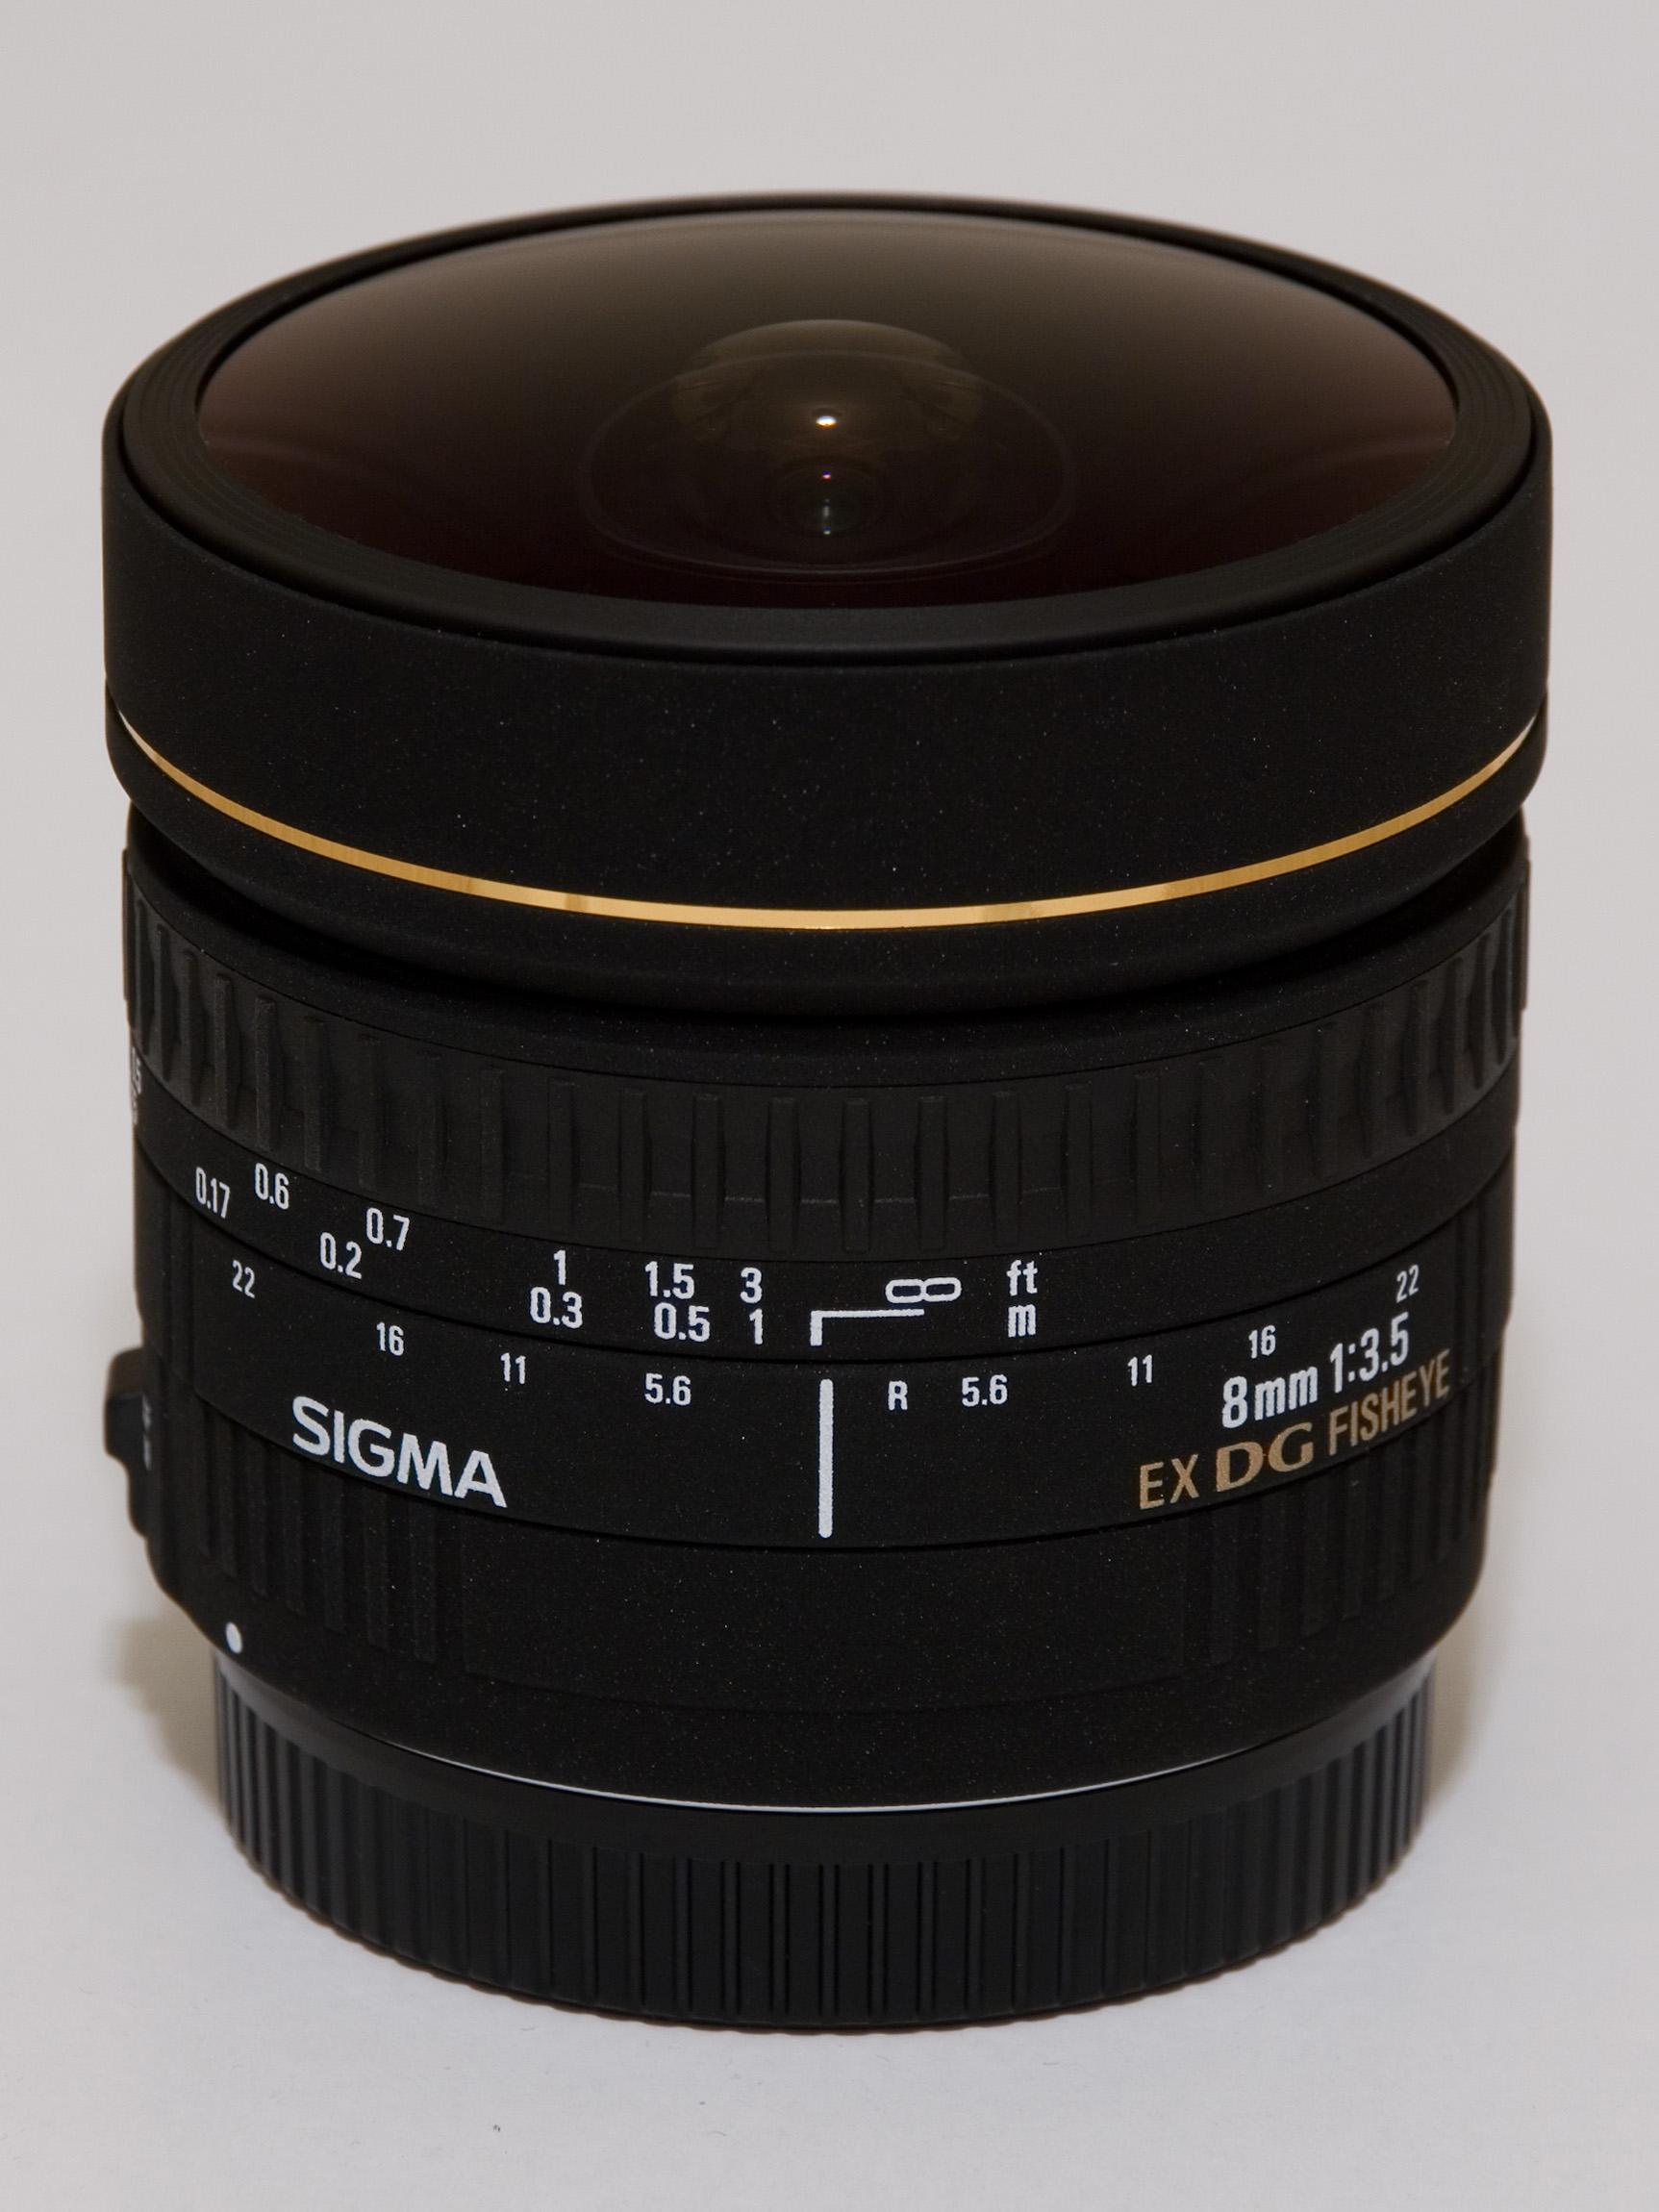 Sigma 8mm Fish Eye Lens